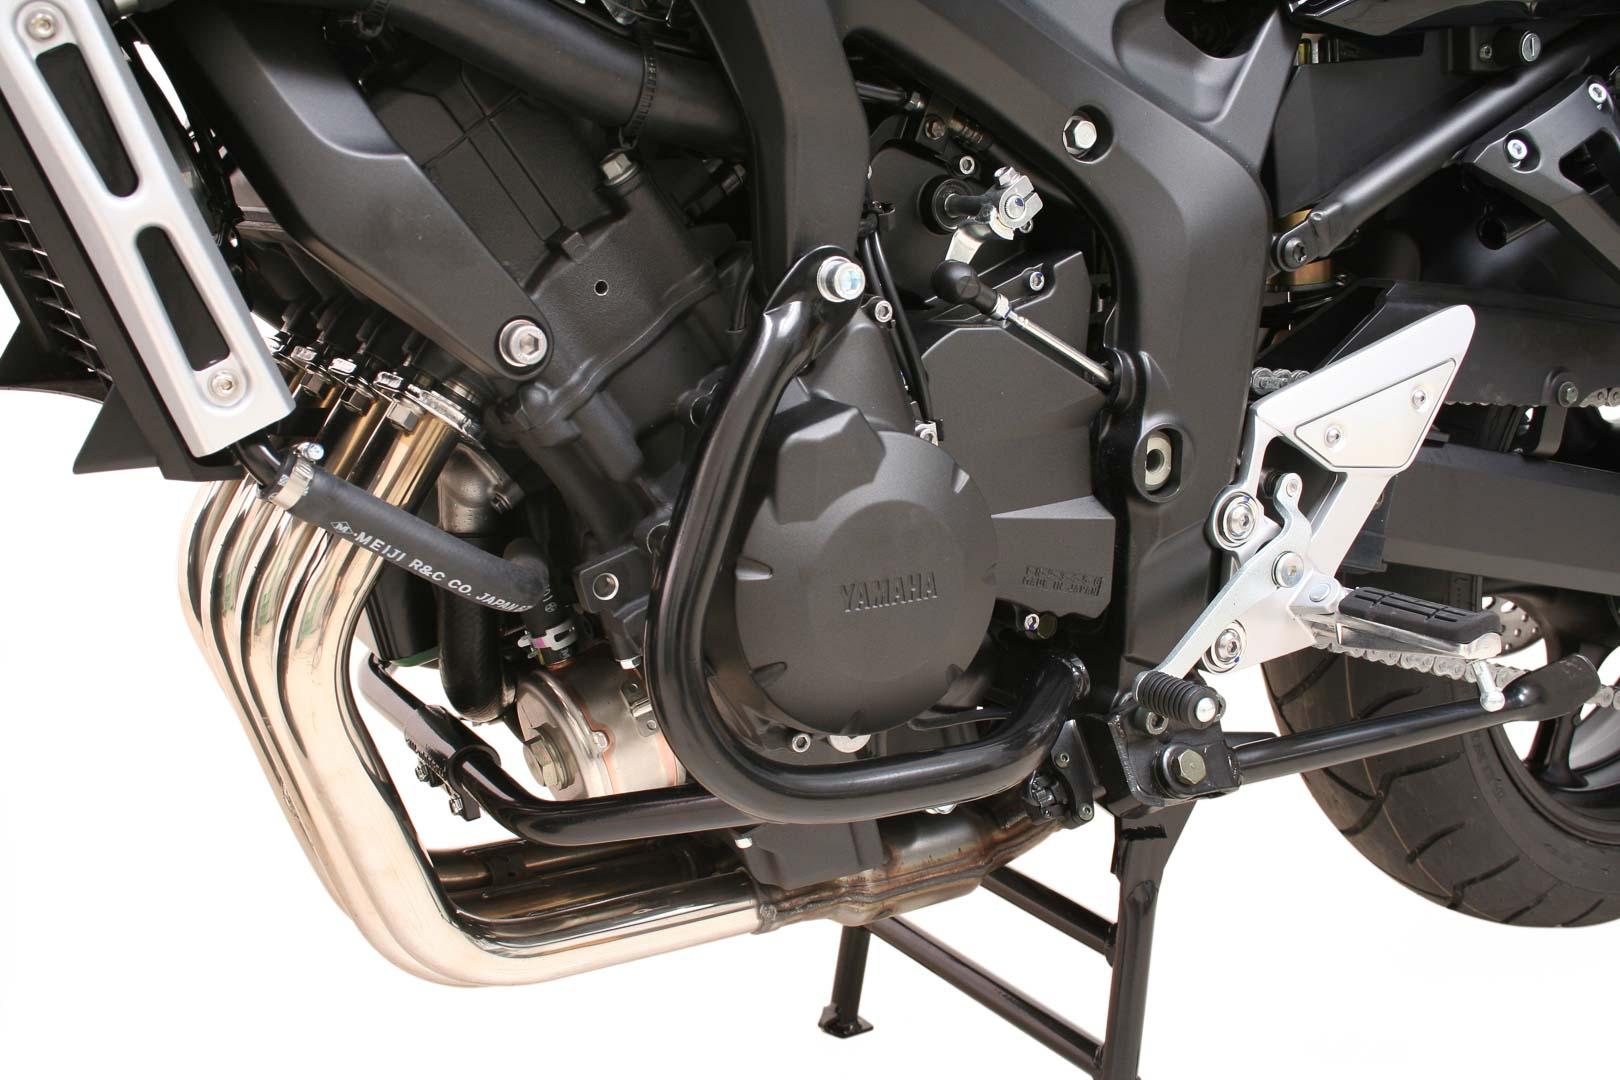 SW-Motech Moottorinsuojarauta Yamaha FZ6 musta